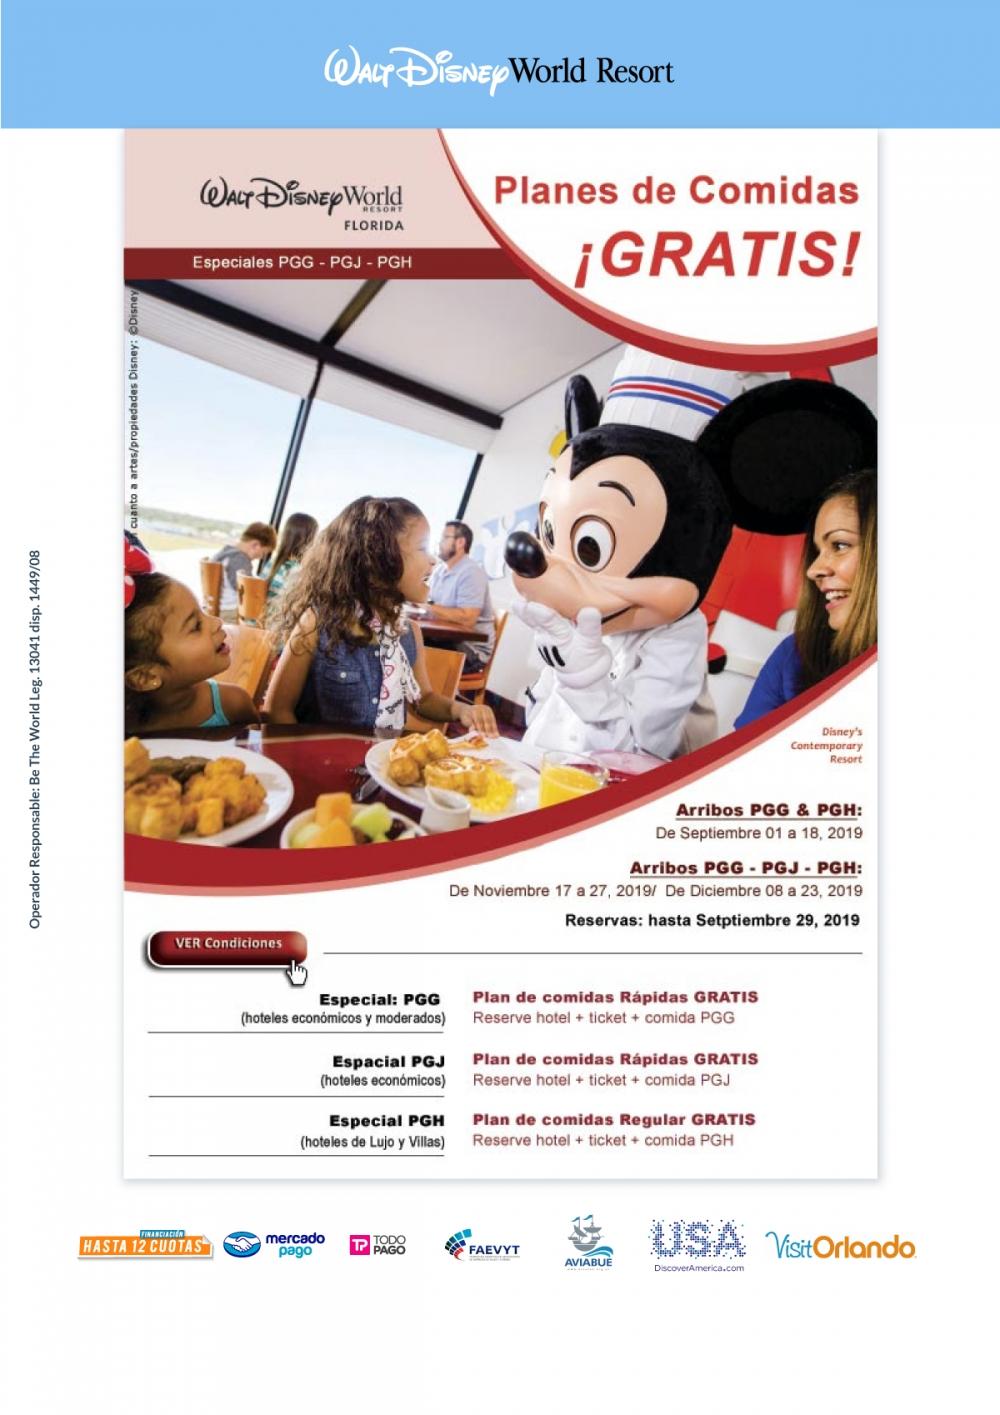 Walt Disney World - Planes de comidas Gratis